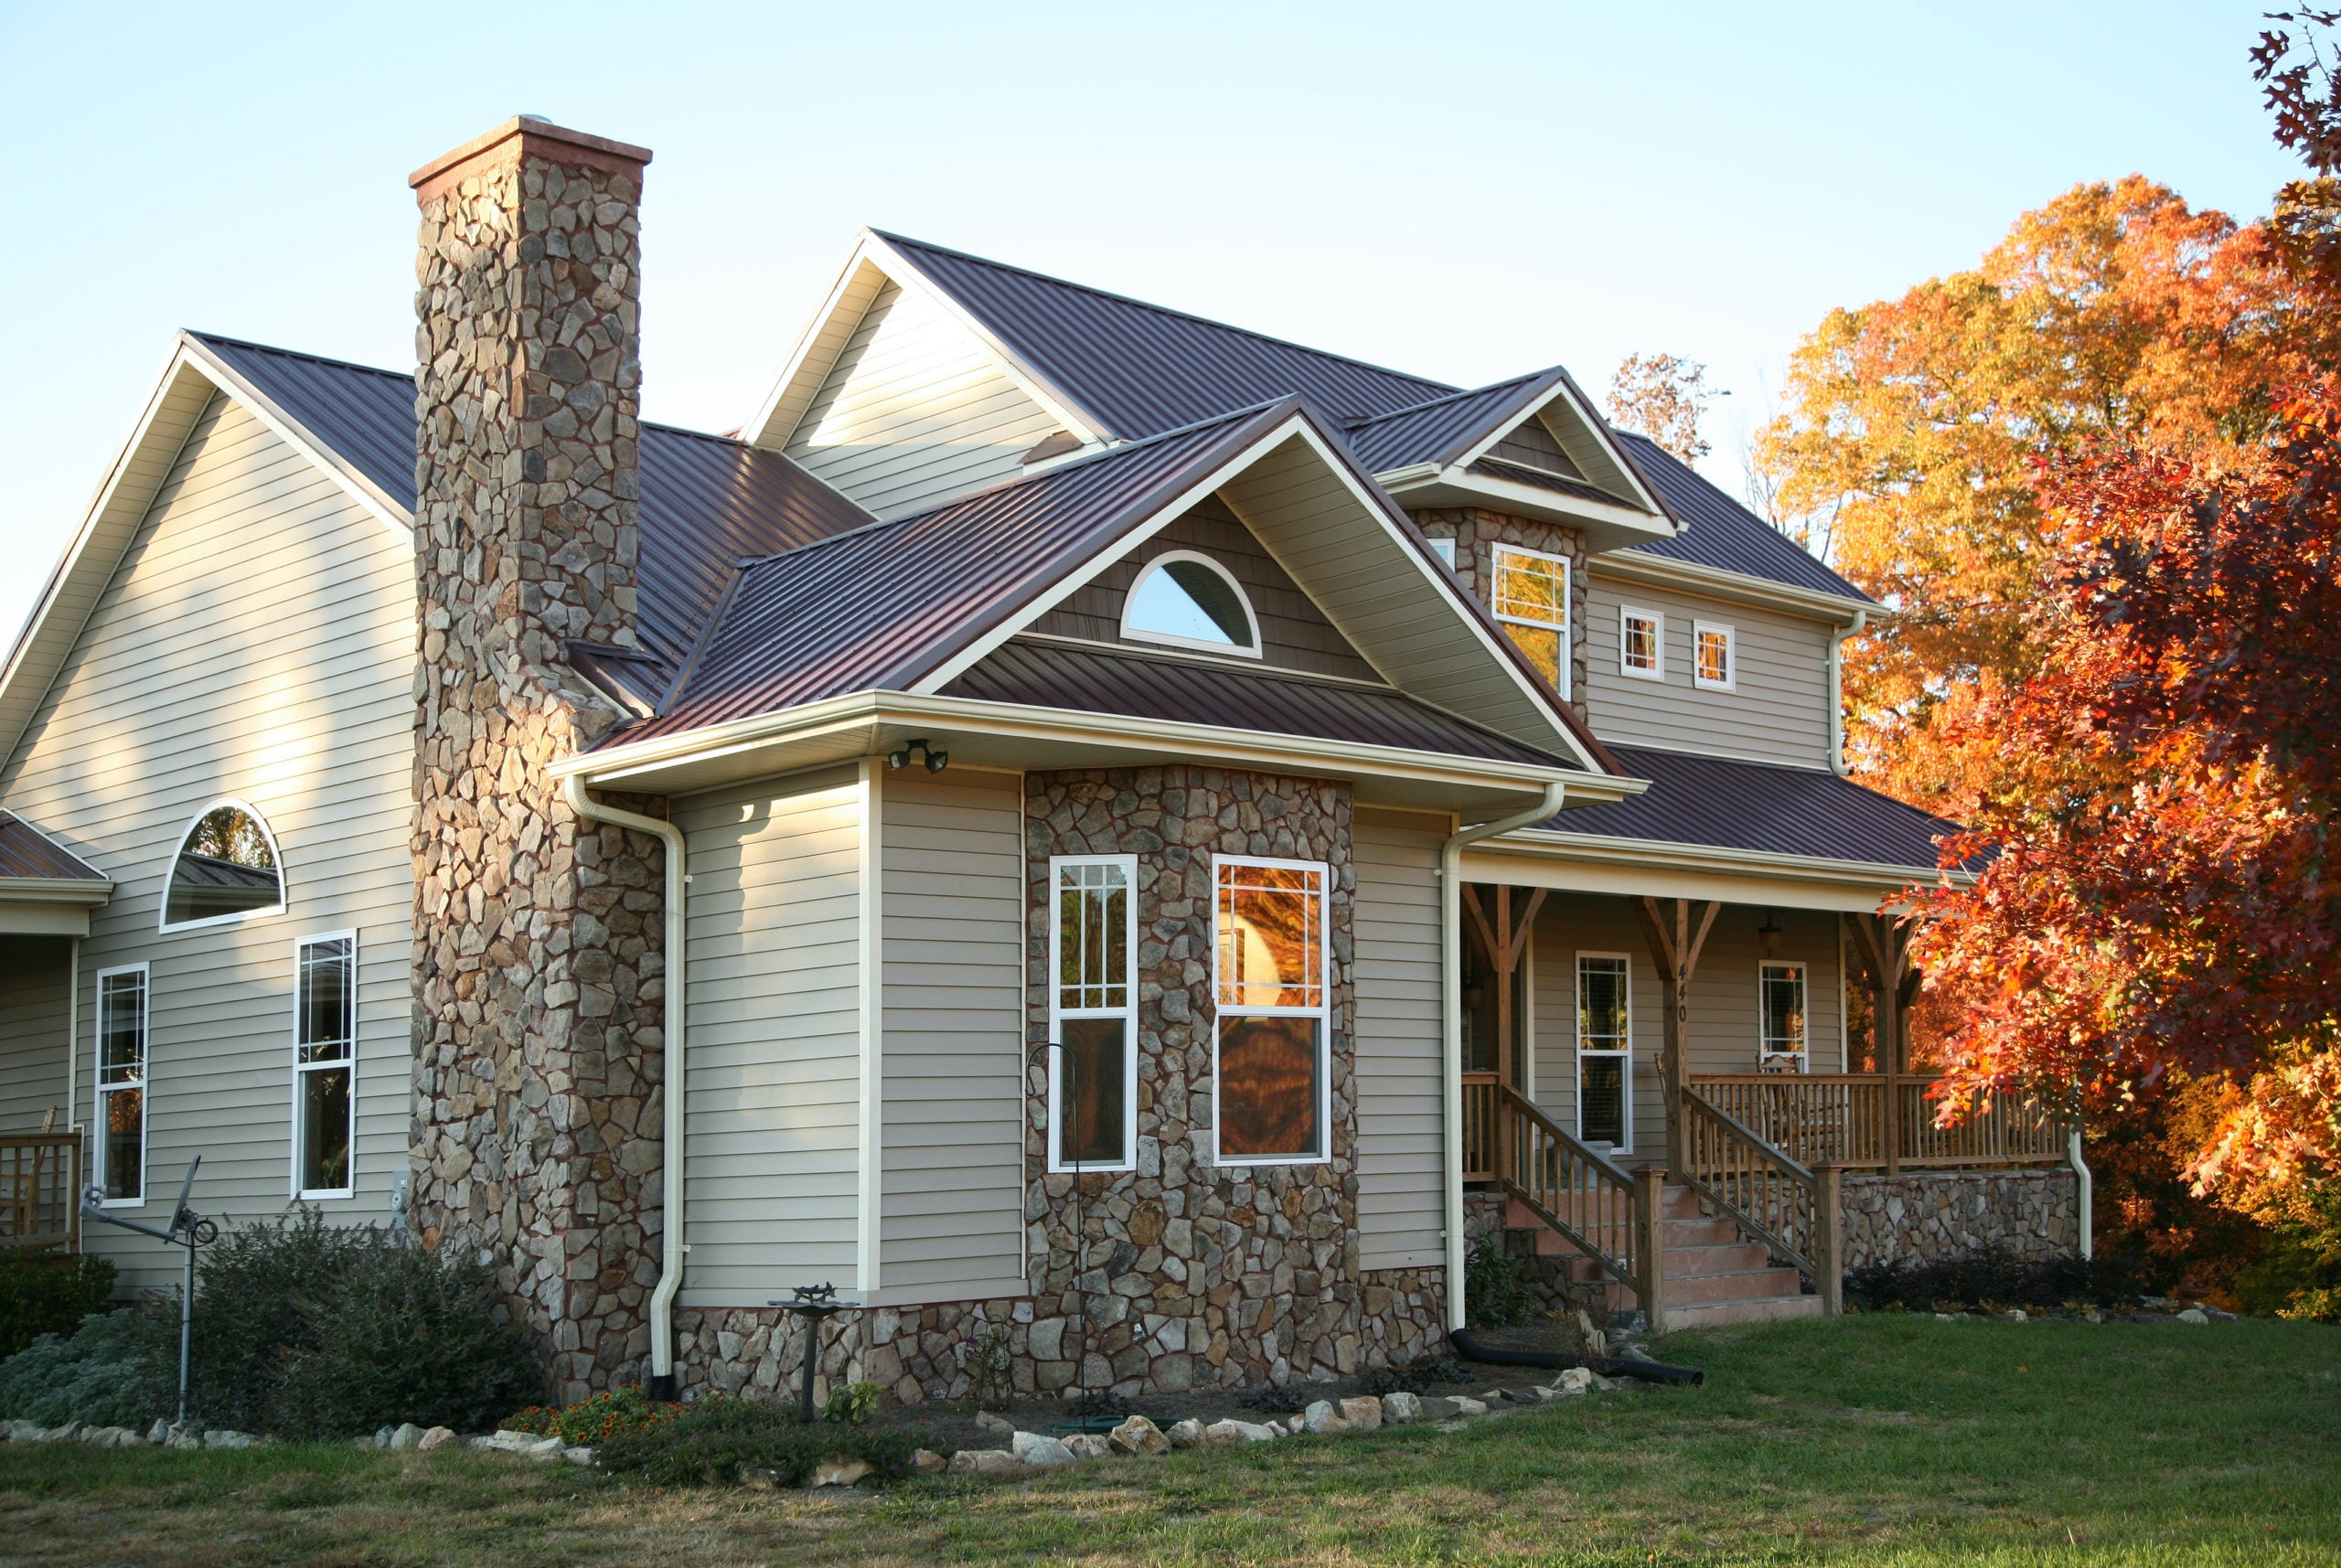 Cobble Stone House